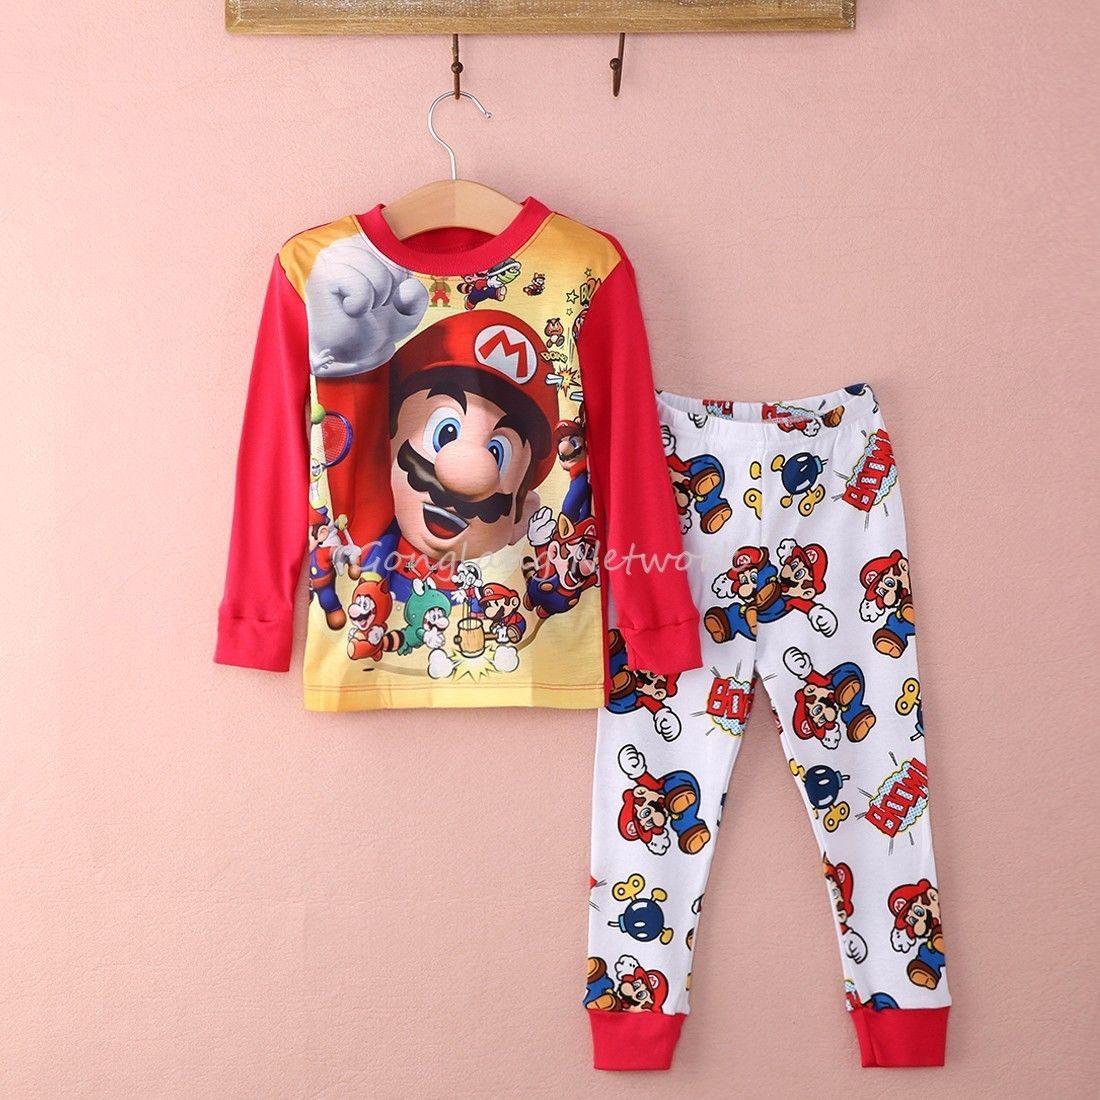 2016 wholesale dropshipping new super mario boys baby kids sleepwear nightwear   pajamas     sets   1~7Y